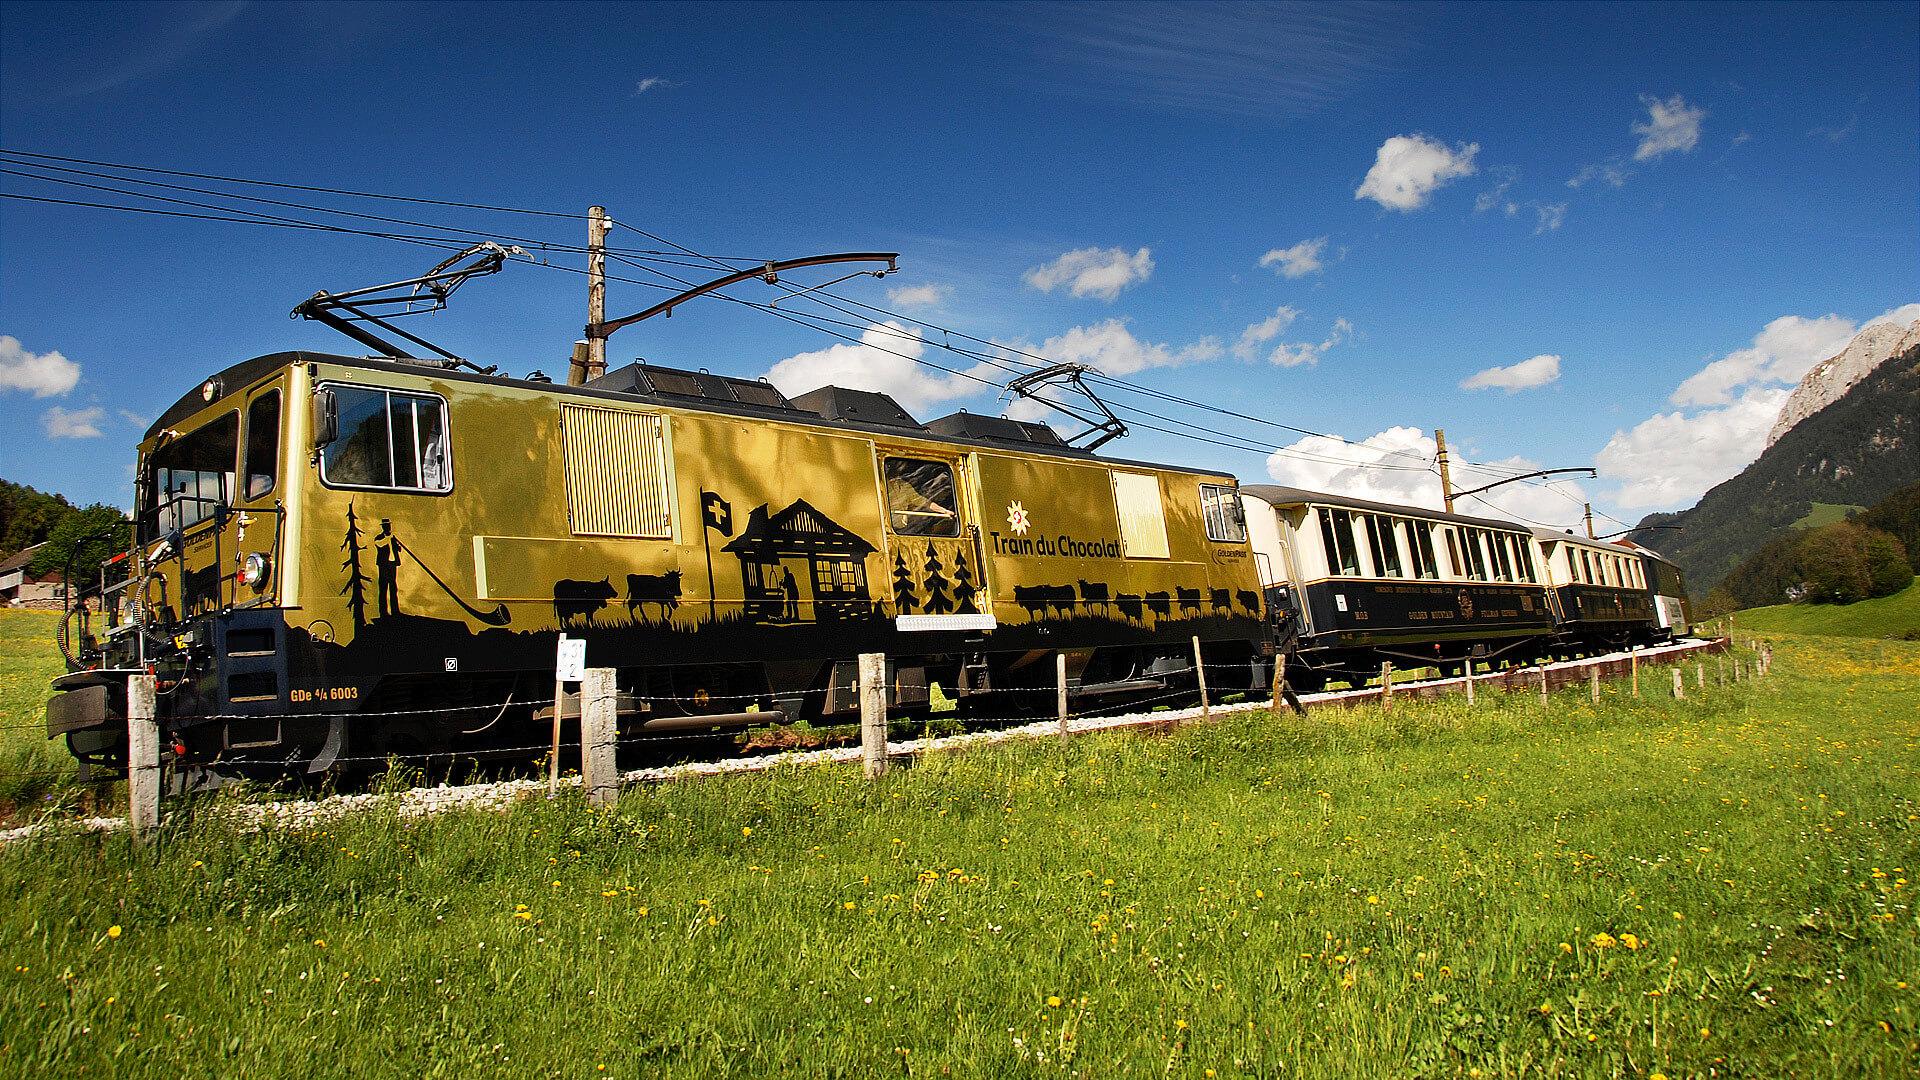 Шоколадный поезд (Swiss Chocolate Train)